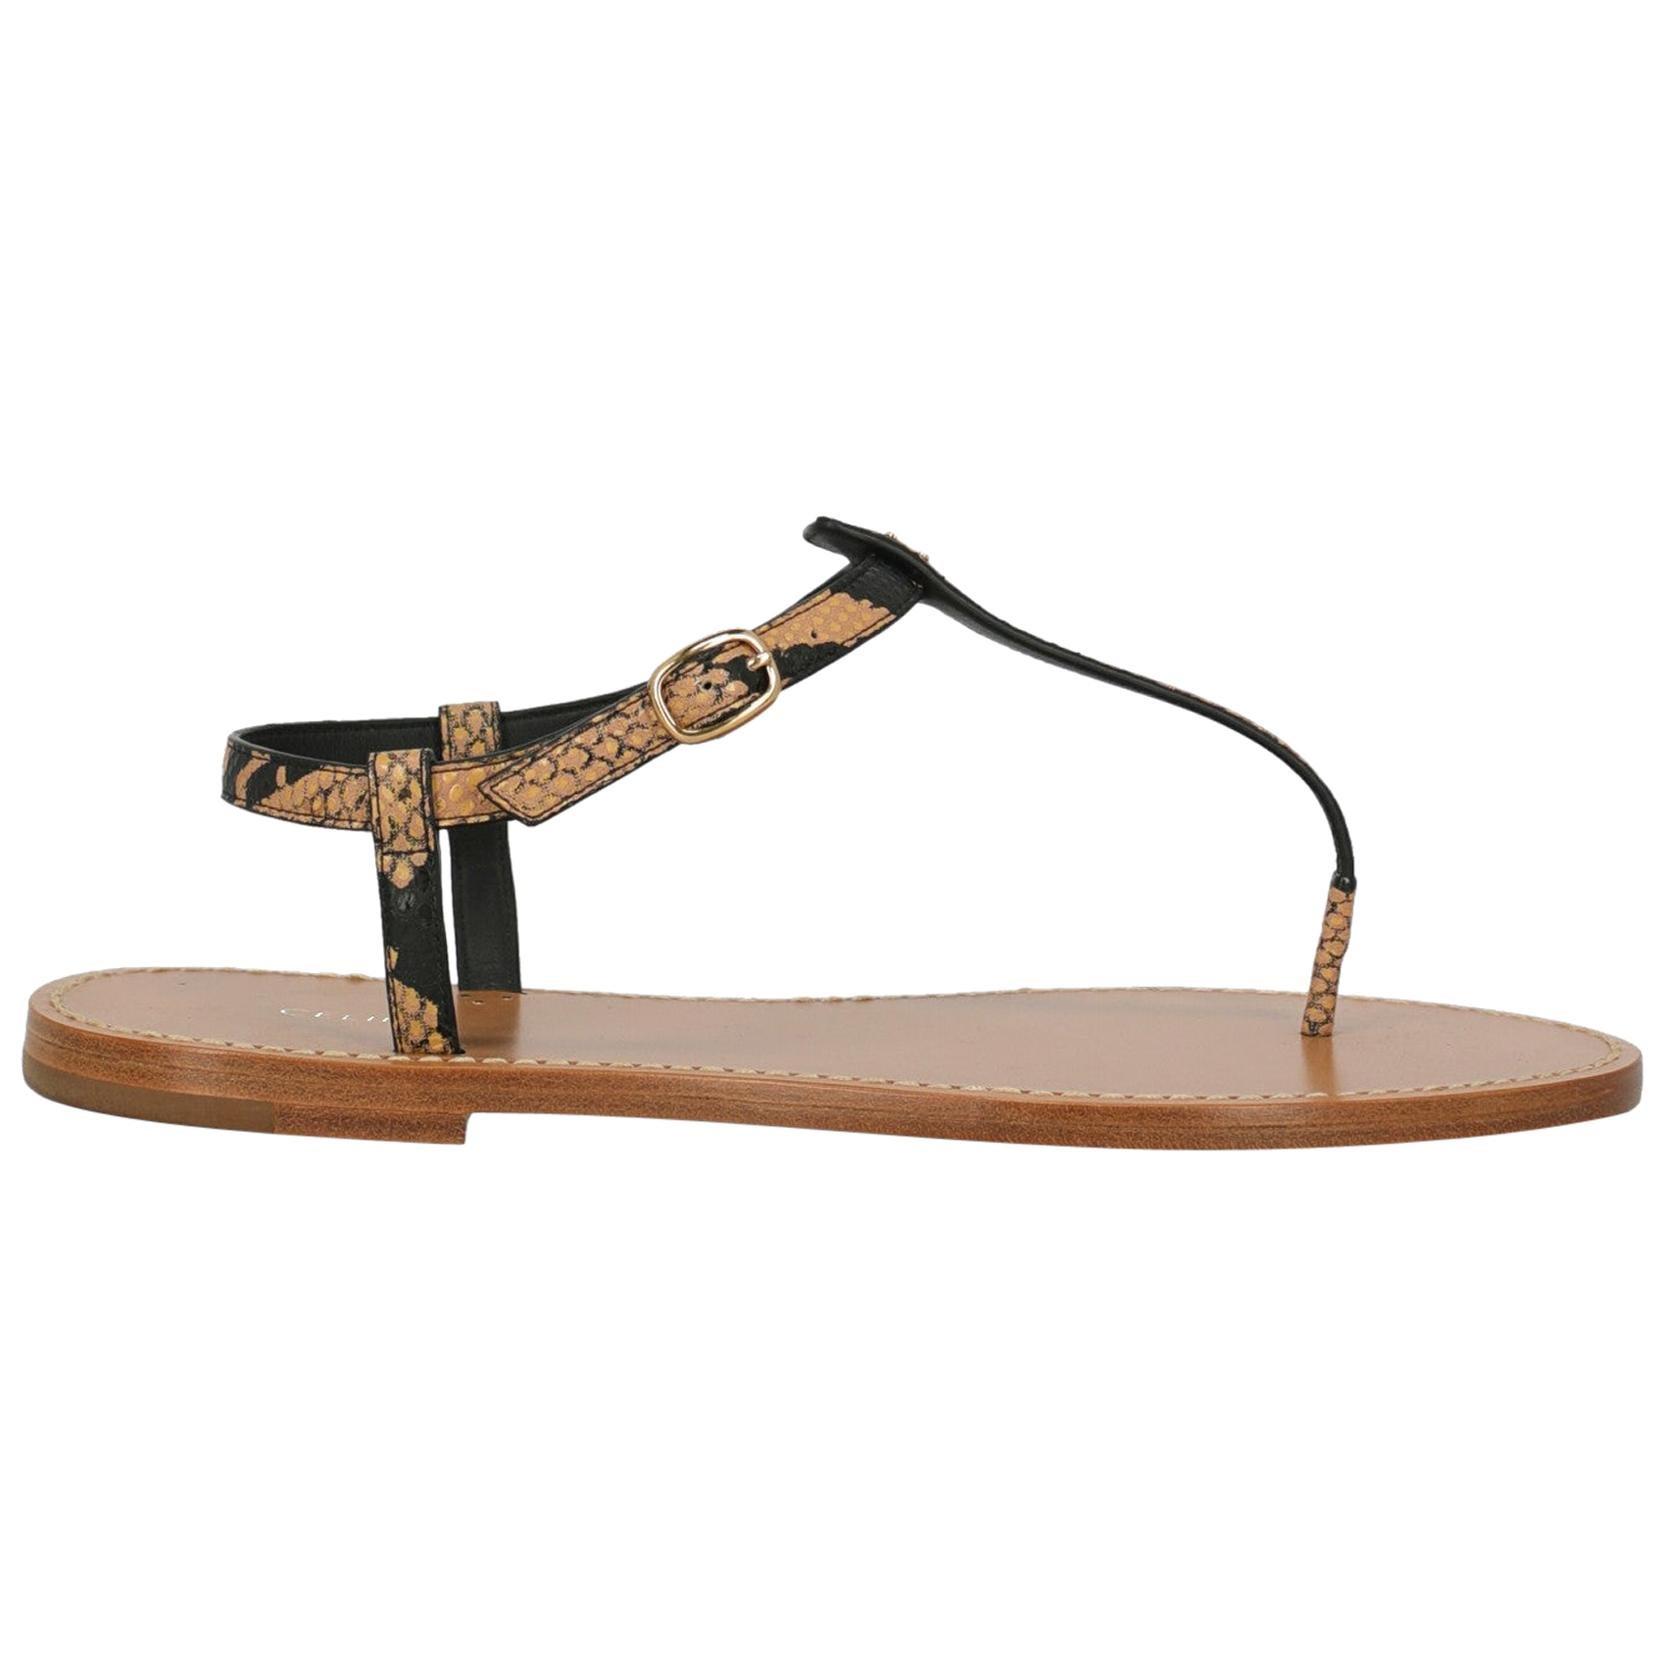 Celine Woman Sandals Beige Leather IT 38